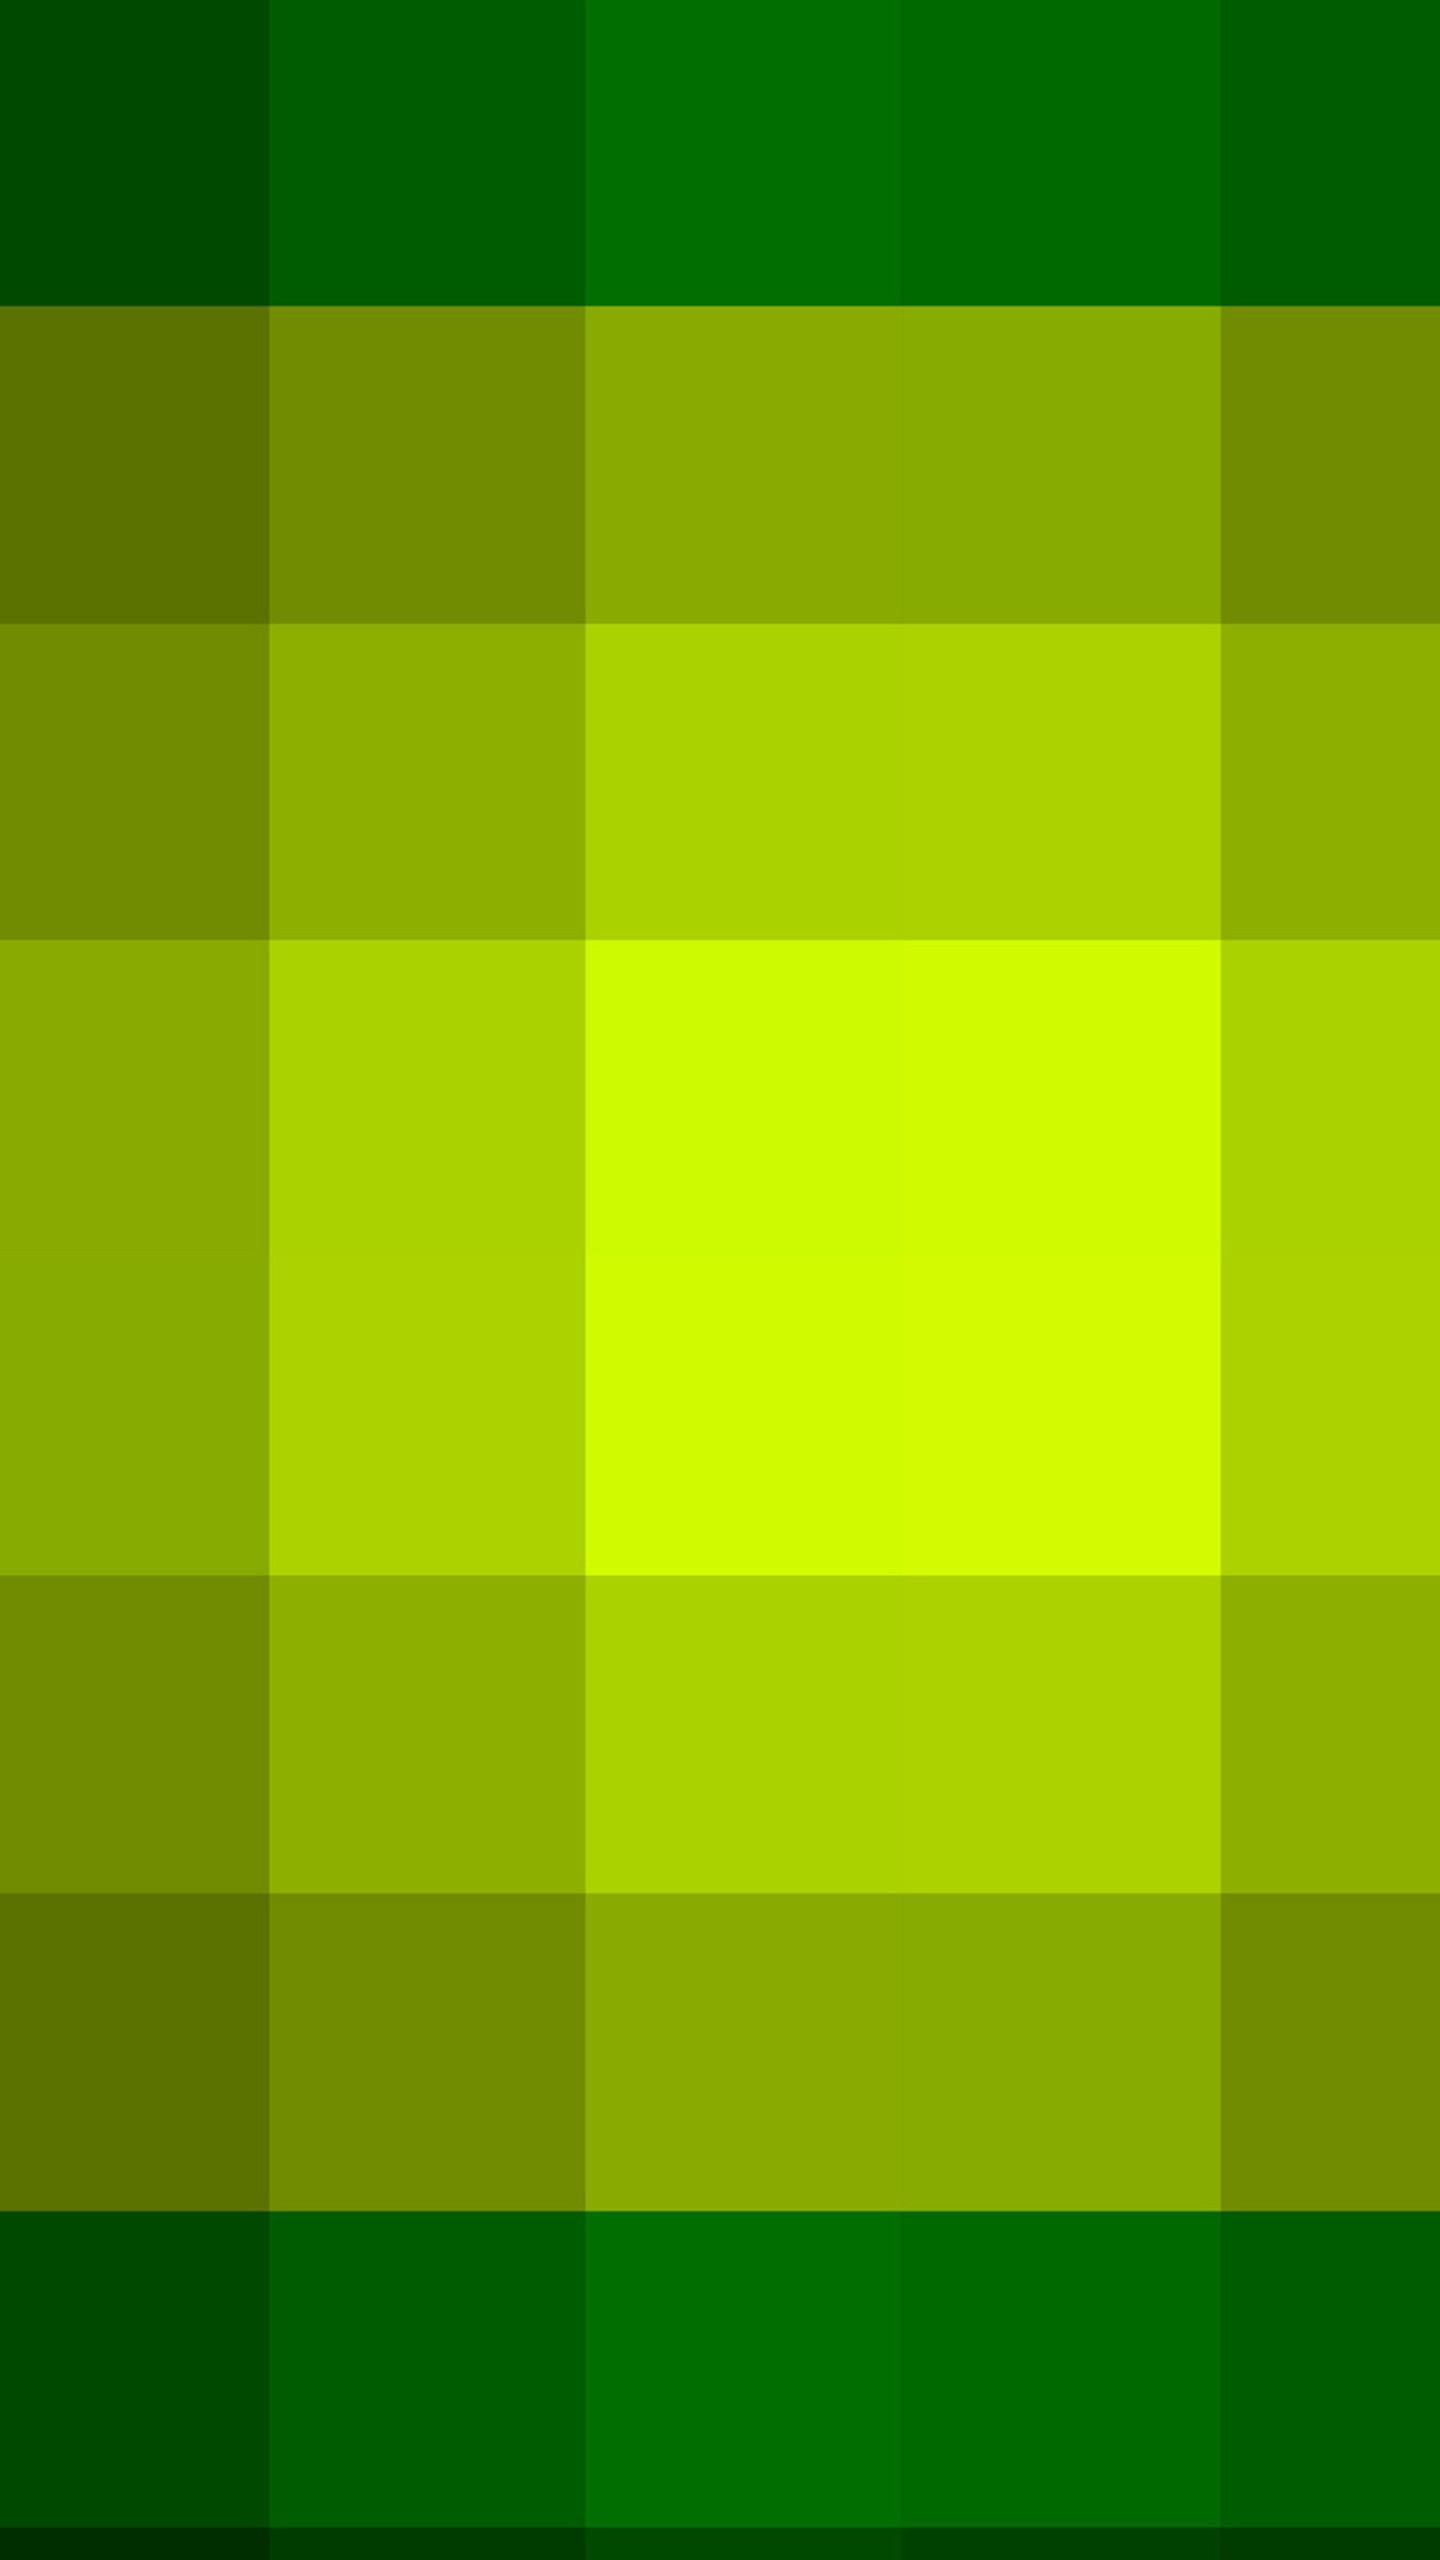 Green Colors For Living Rooms: Green Color Wallpaper ·① WallpaperTag